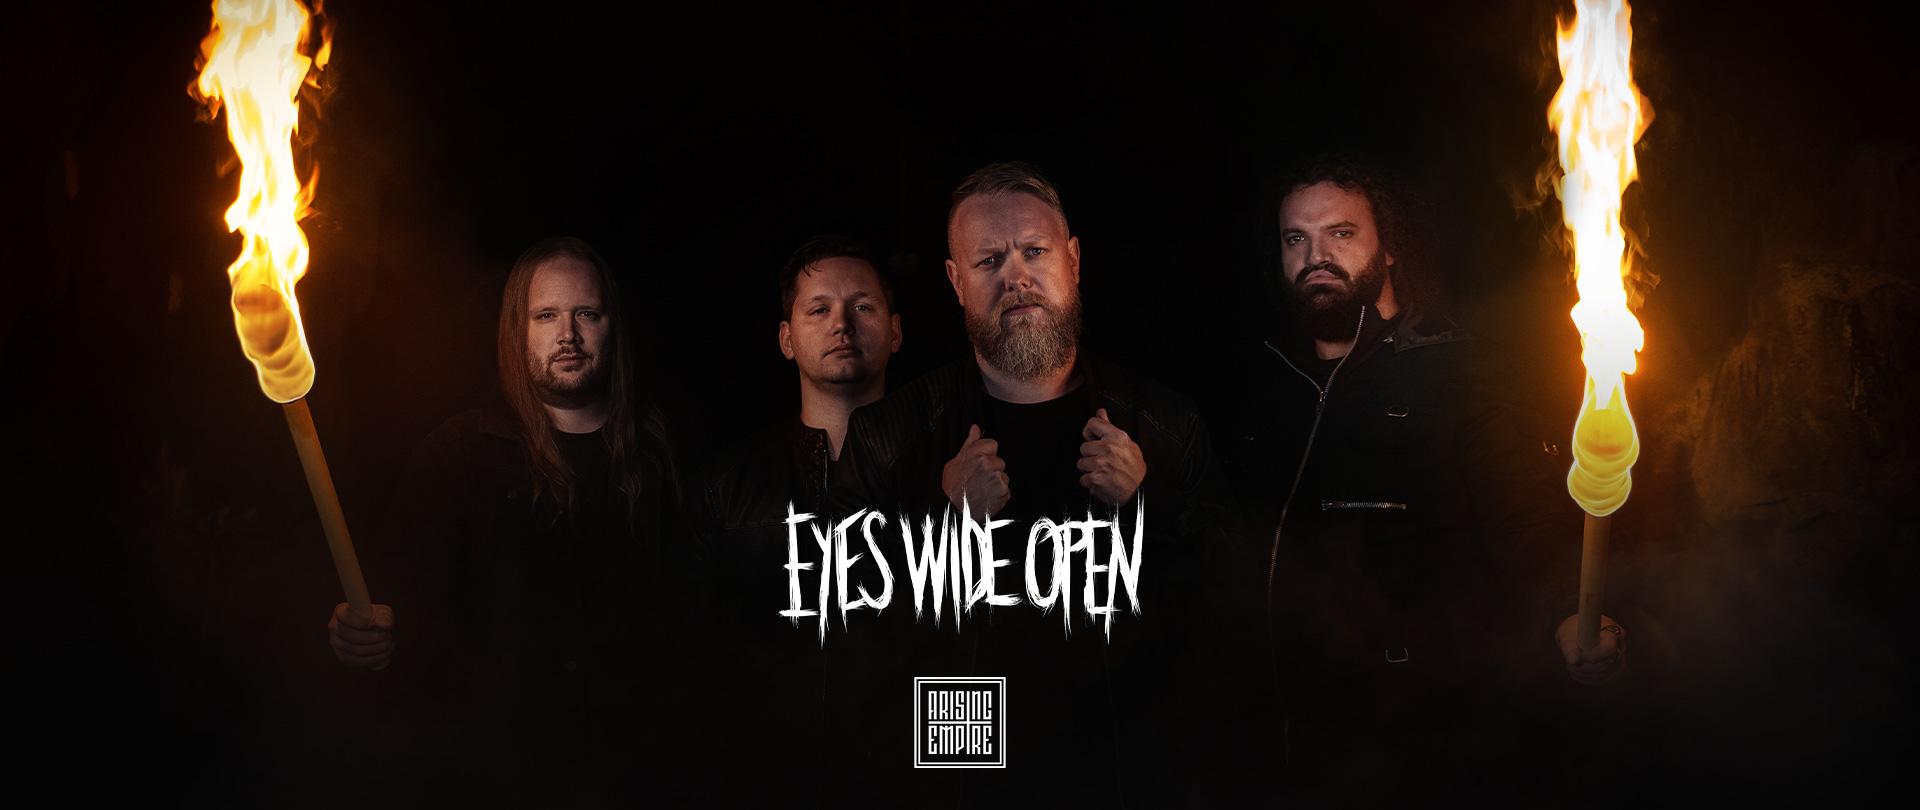 Eyes Wide Open at Arising Empire • Official Online Shop / EN